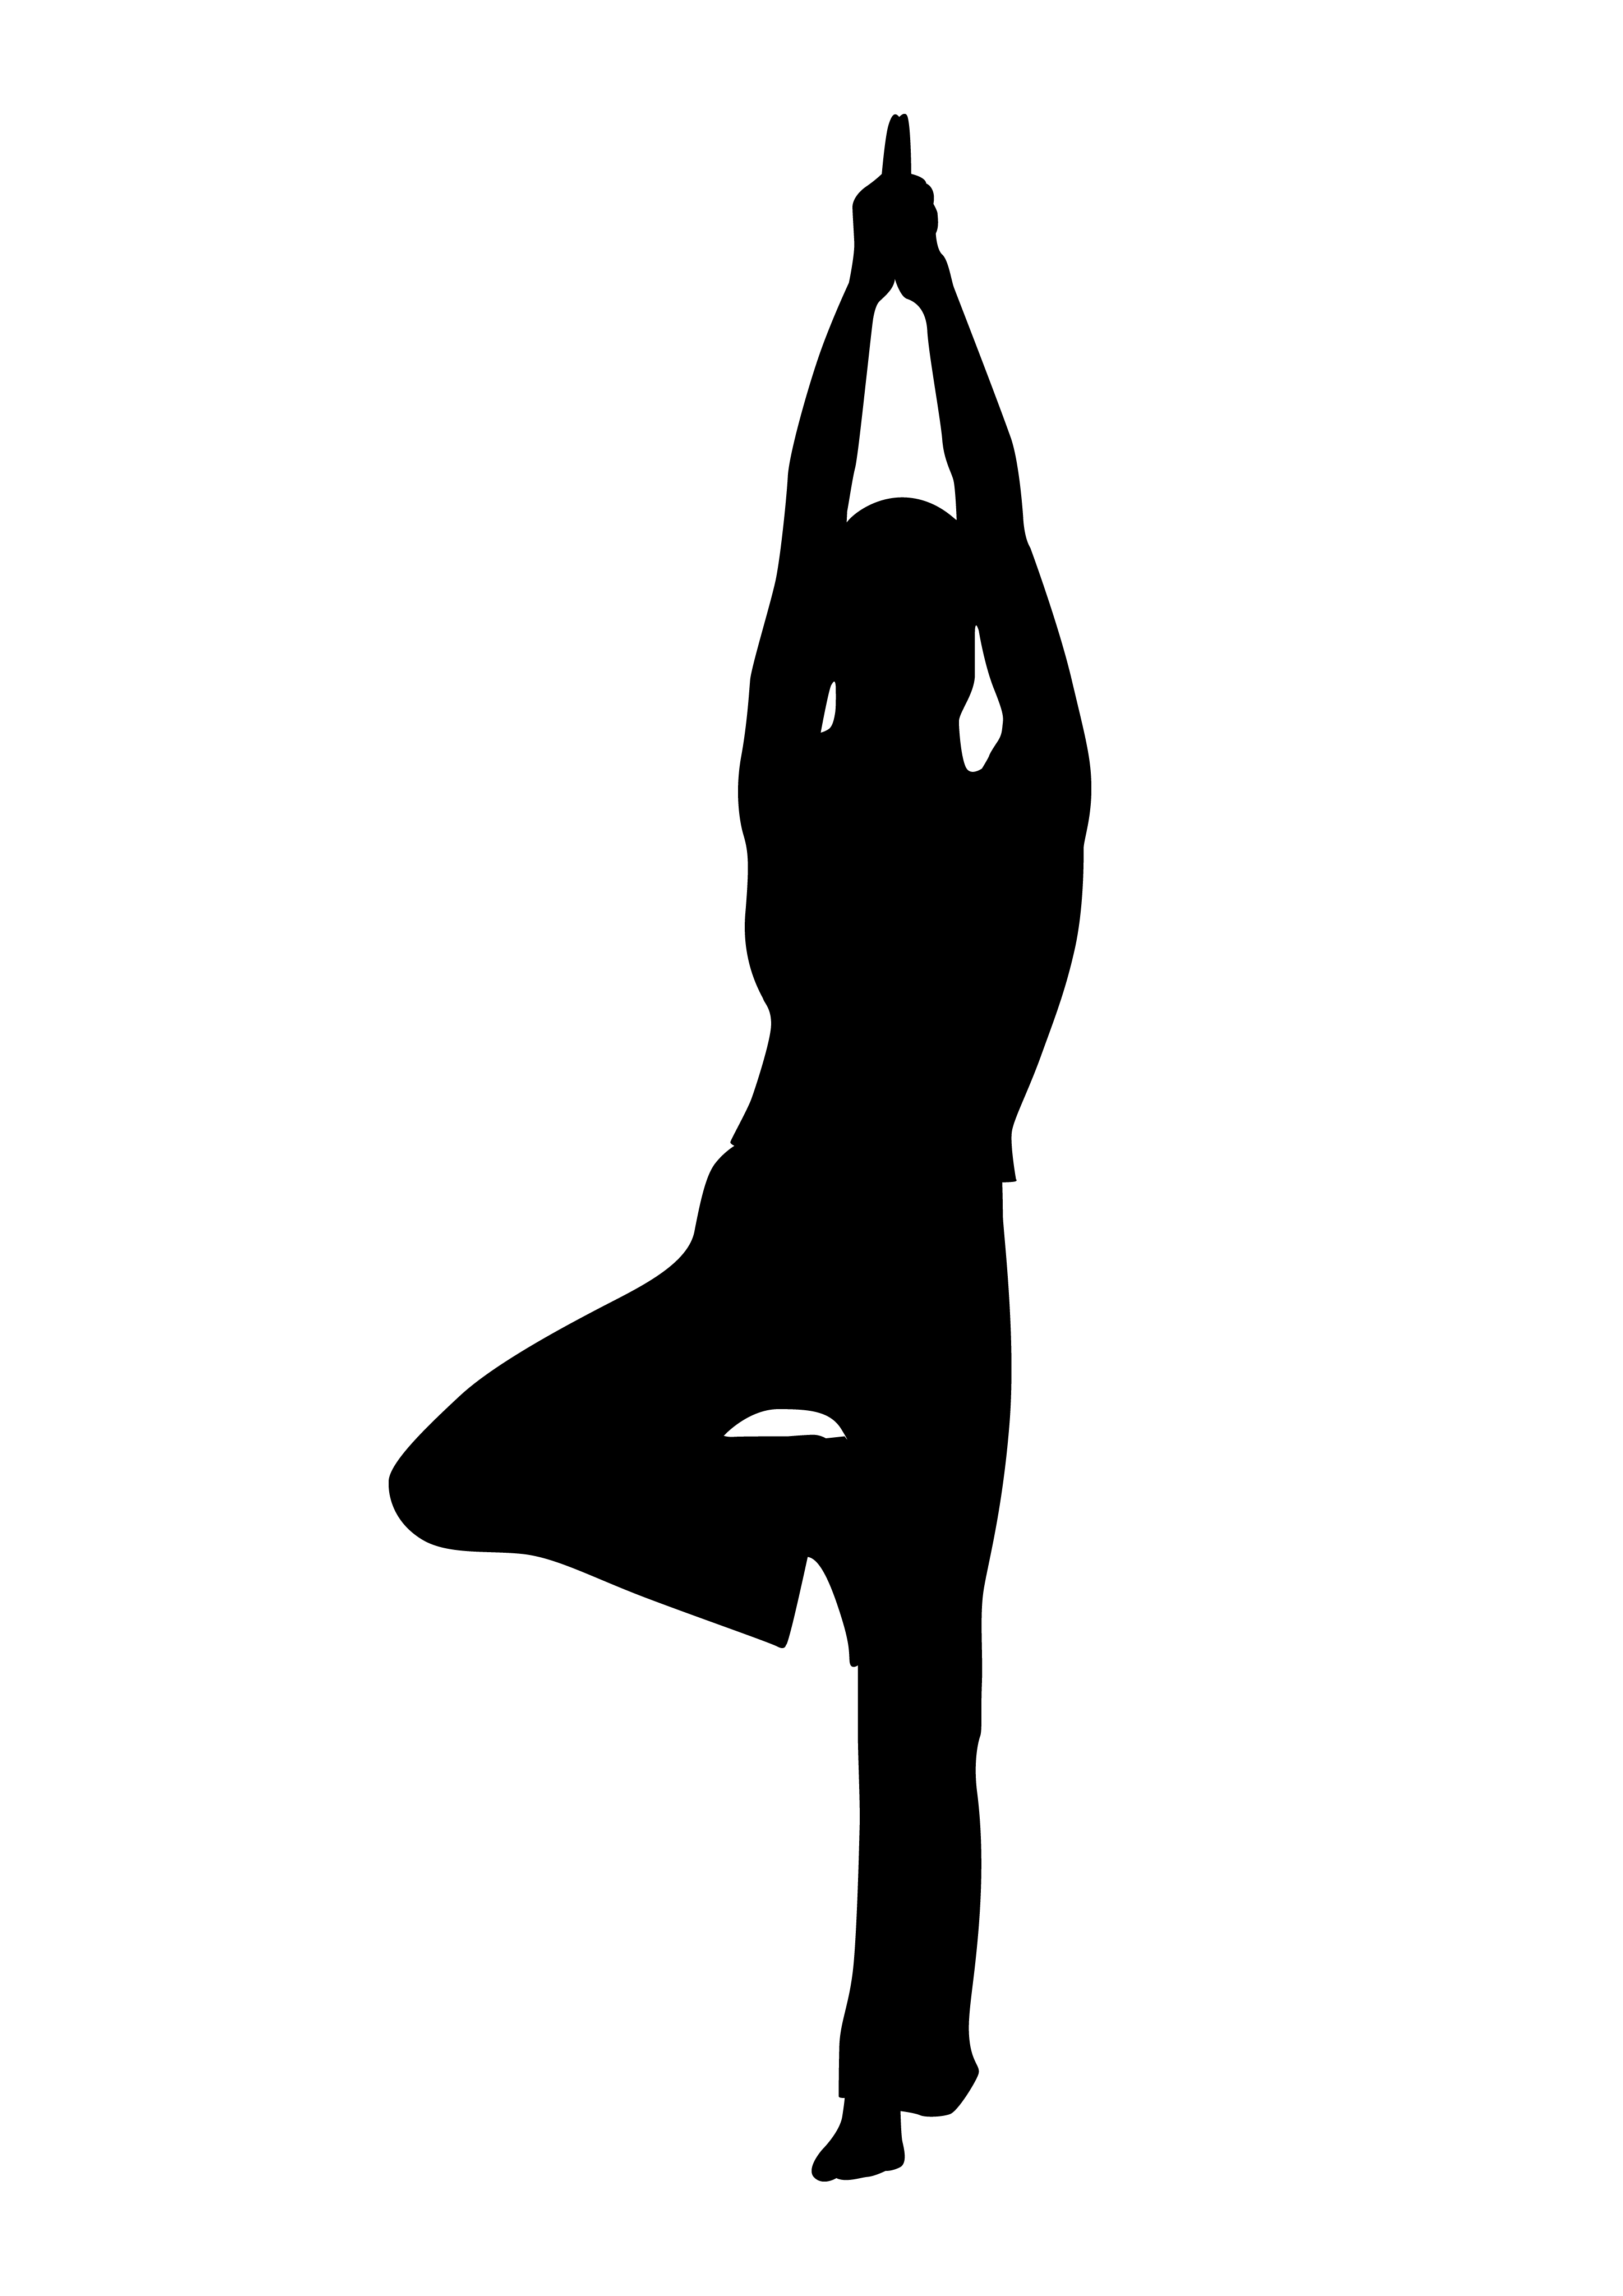 Yoga Poses Stylized Clip Art ... 9075f45-Yoga Poses Stylized clip art ... 9075f45348b4f792673f741ad1d3e3 .-17